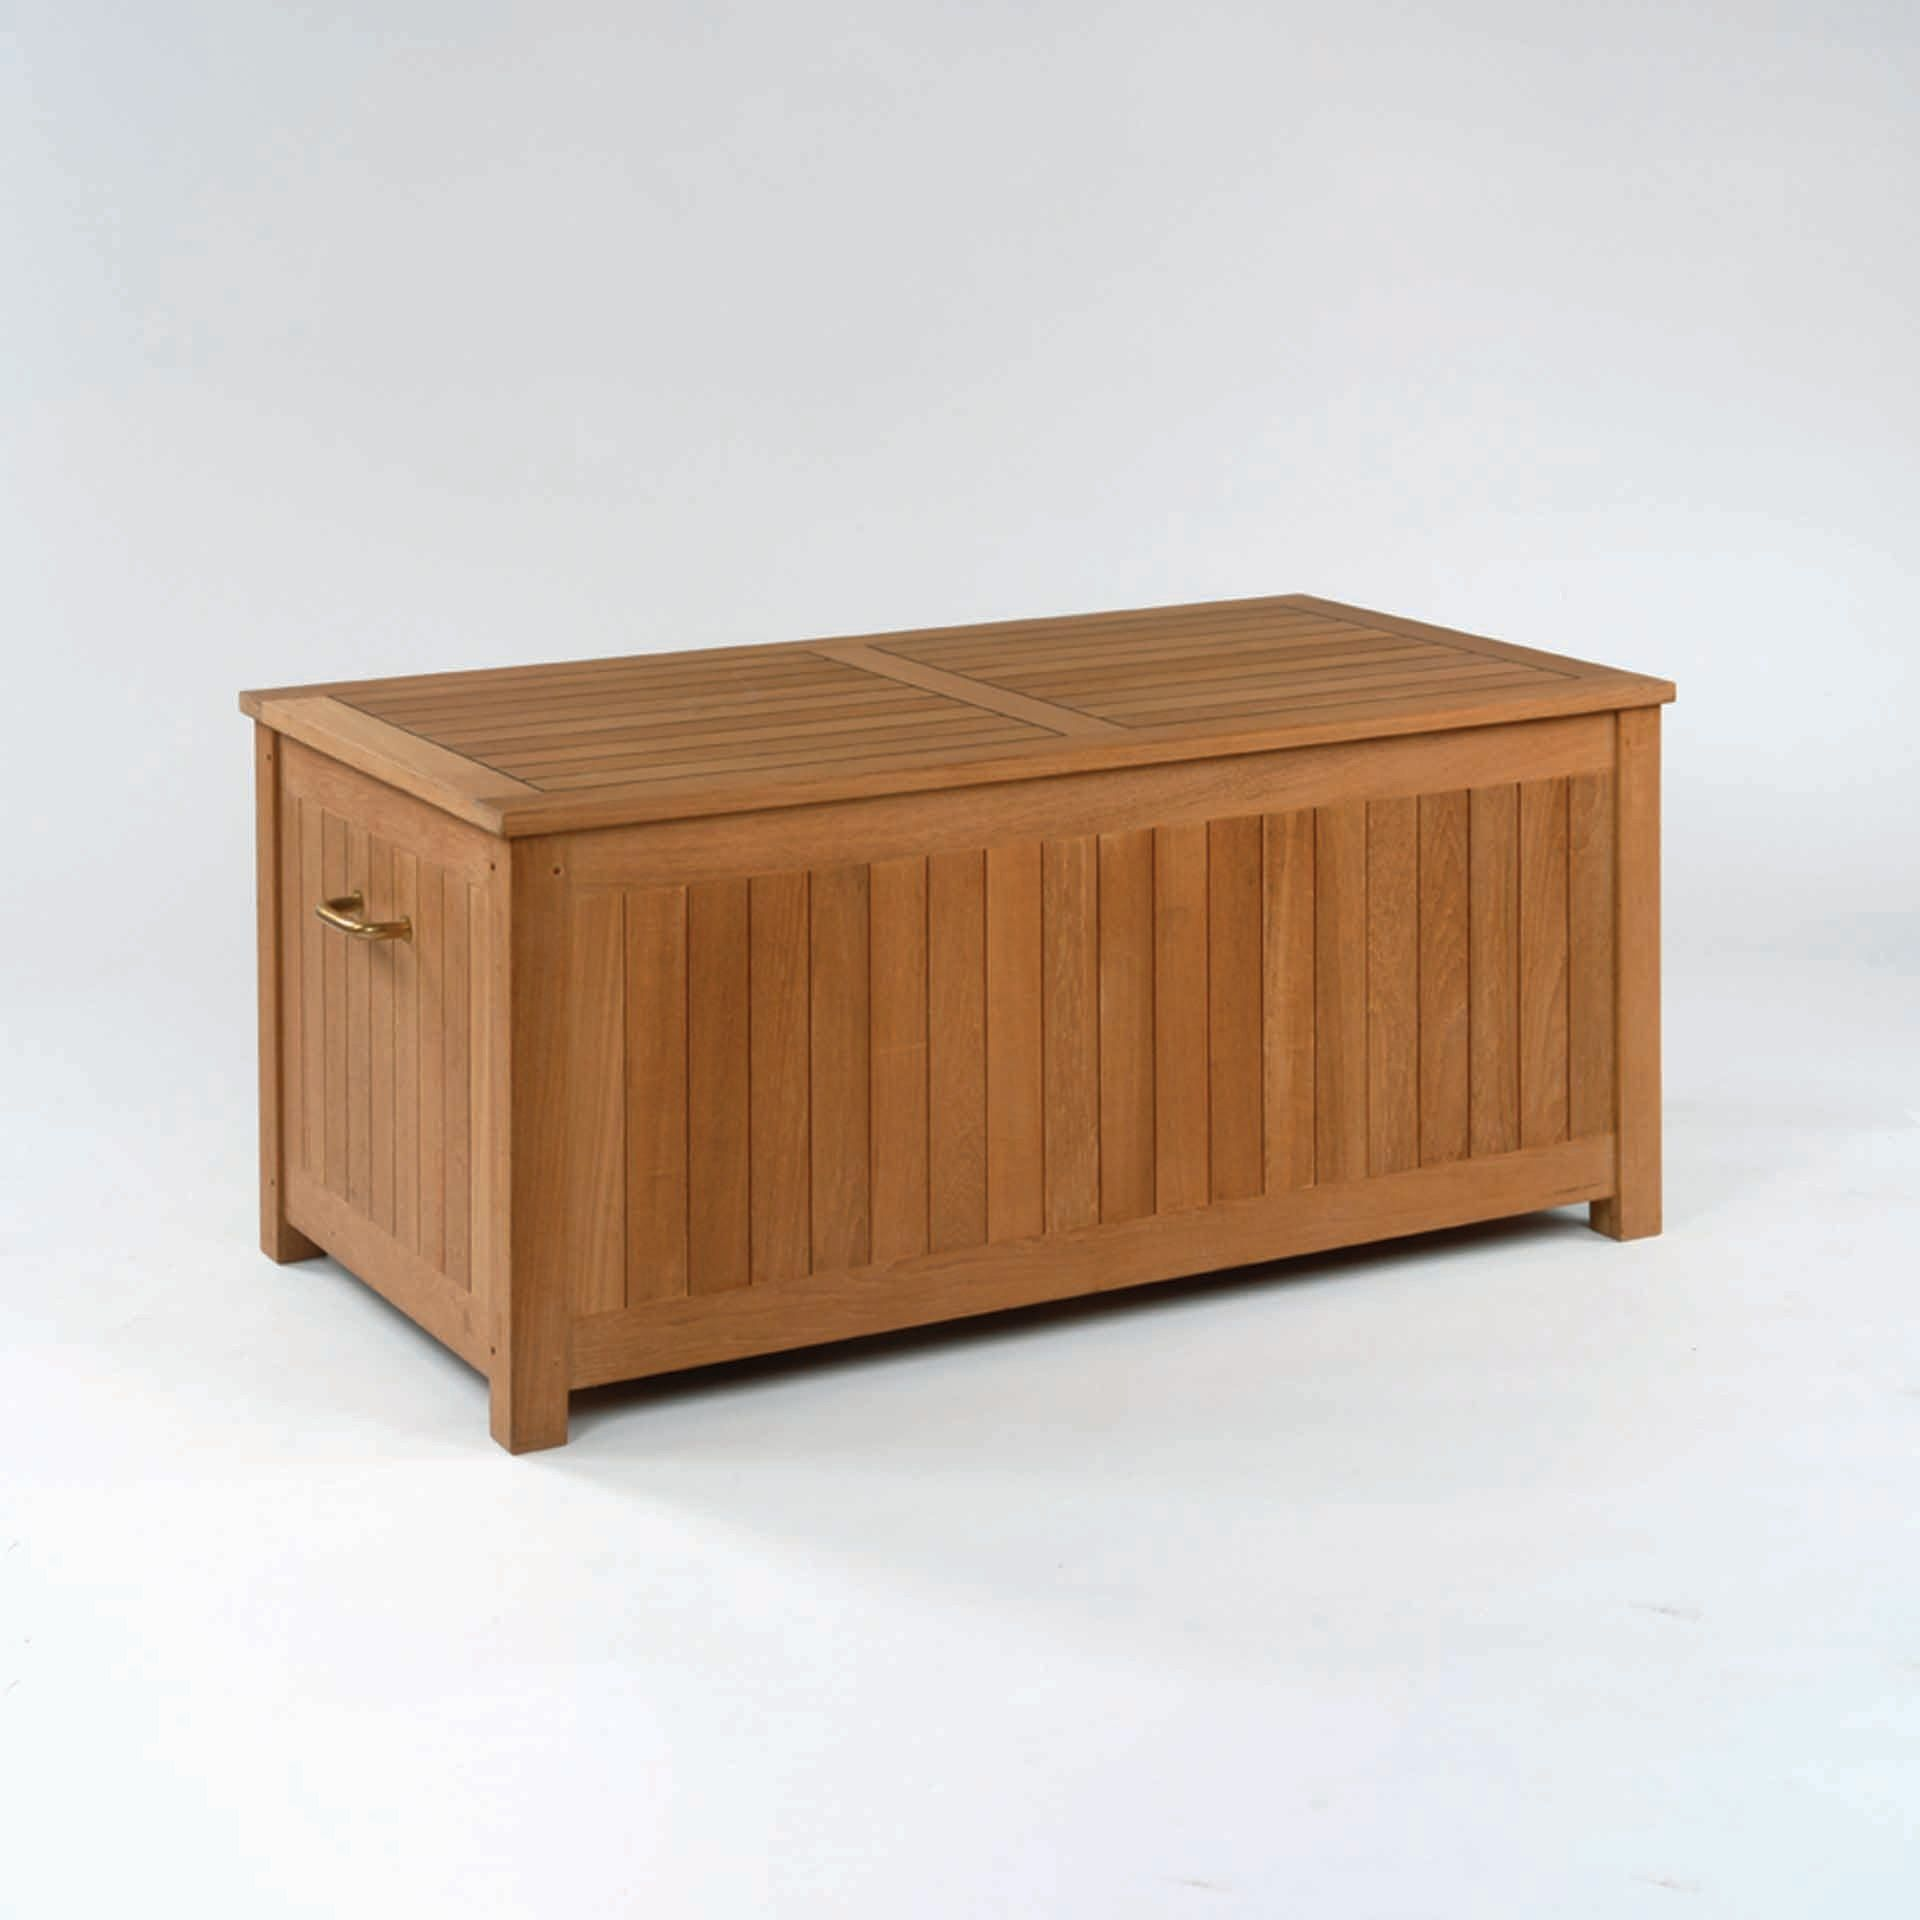 Kingsley Bate 53x28 Quot Rectangle Cushion Box Leisure Living